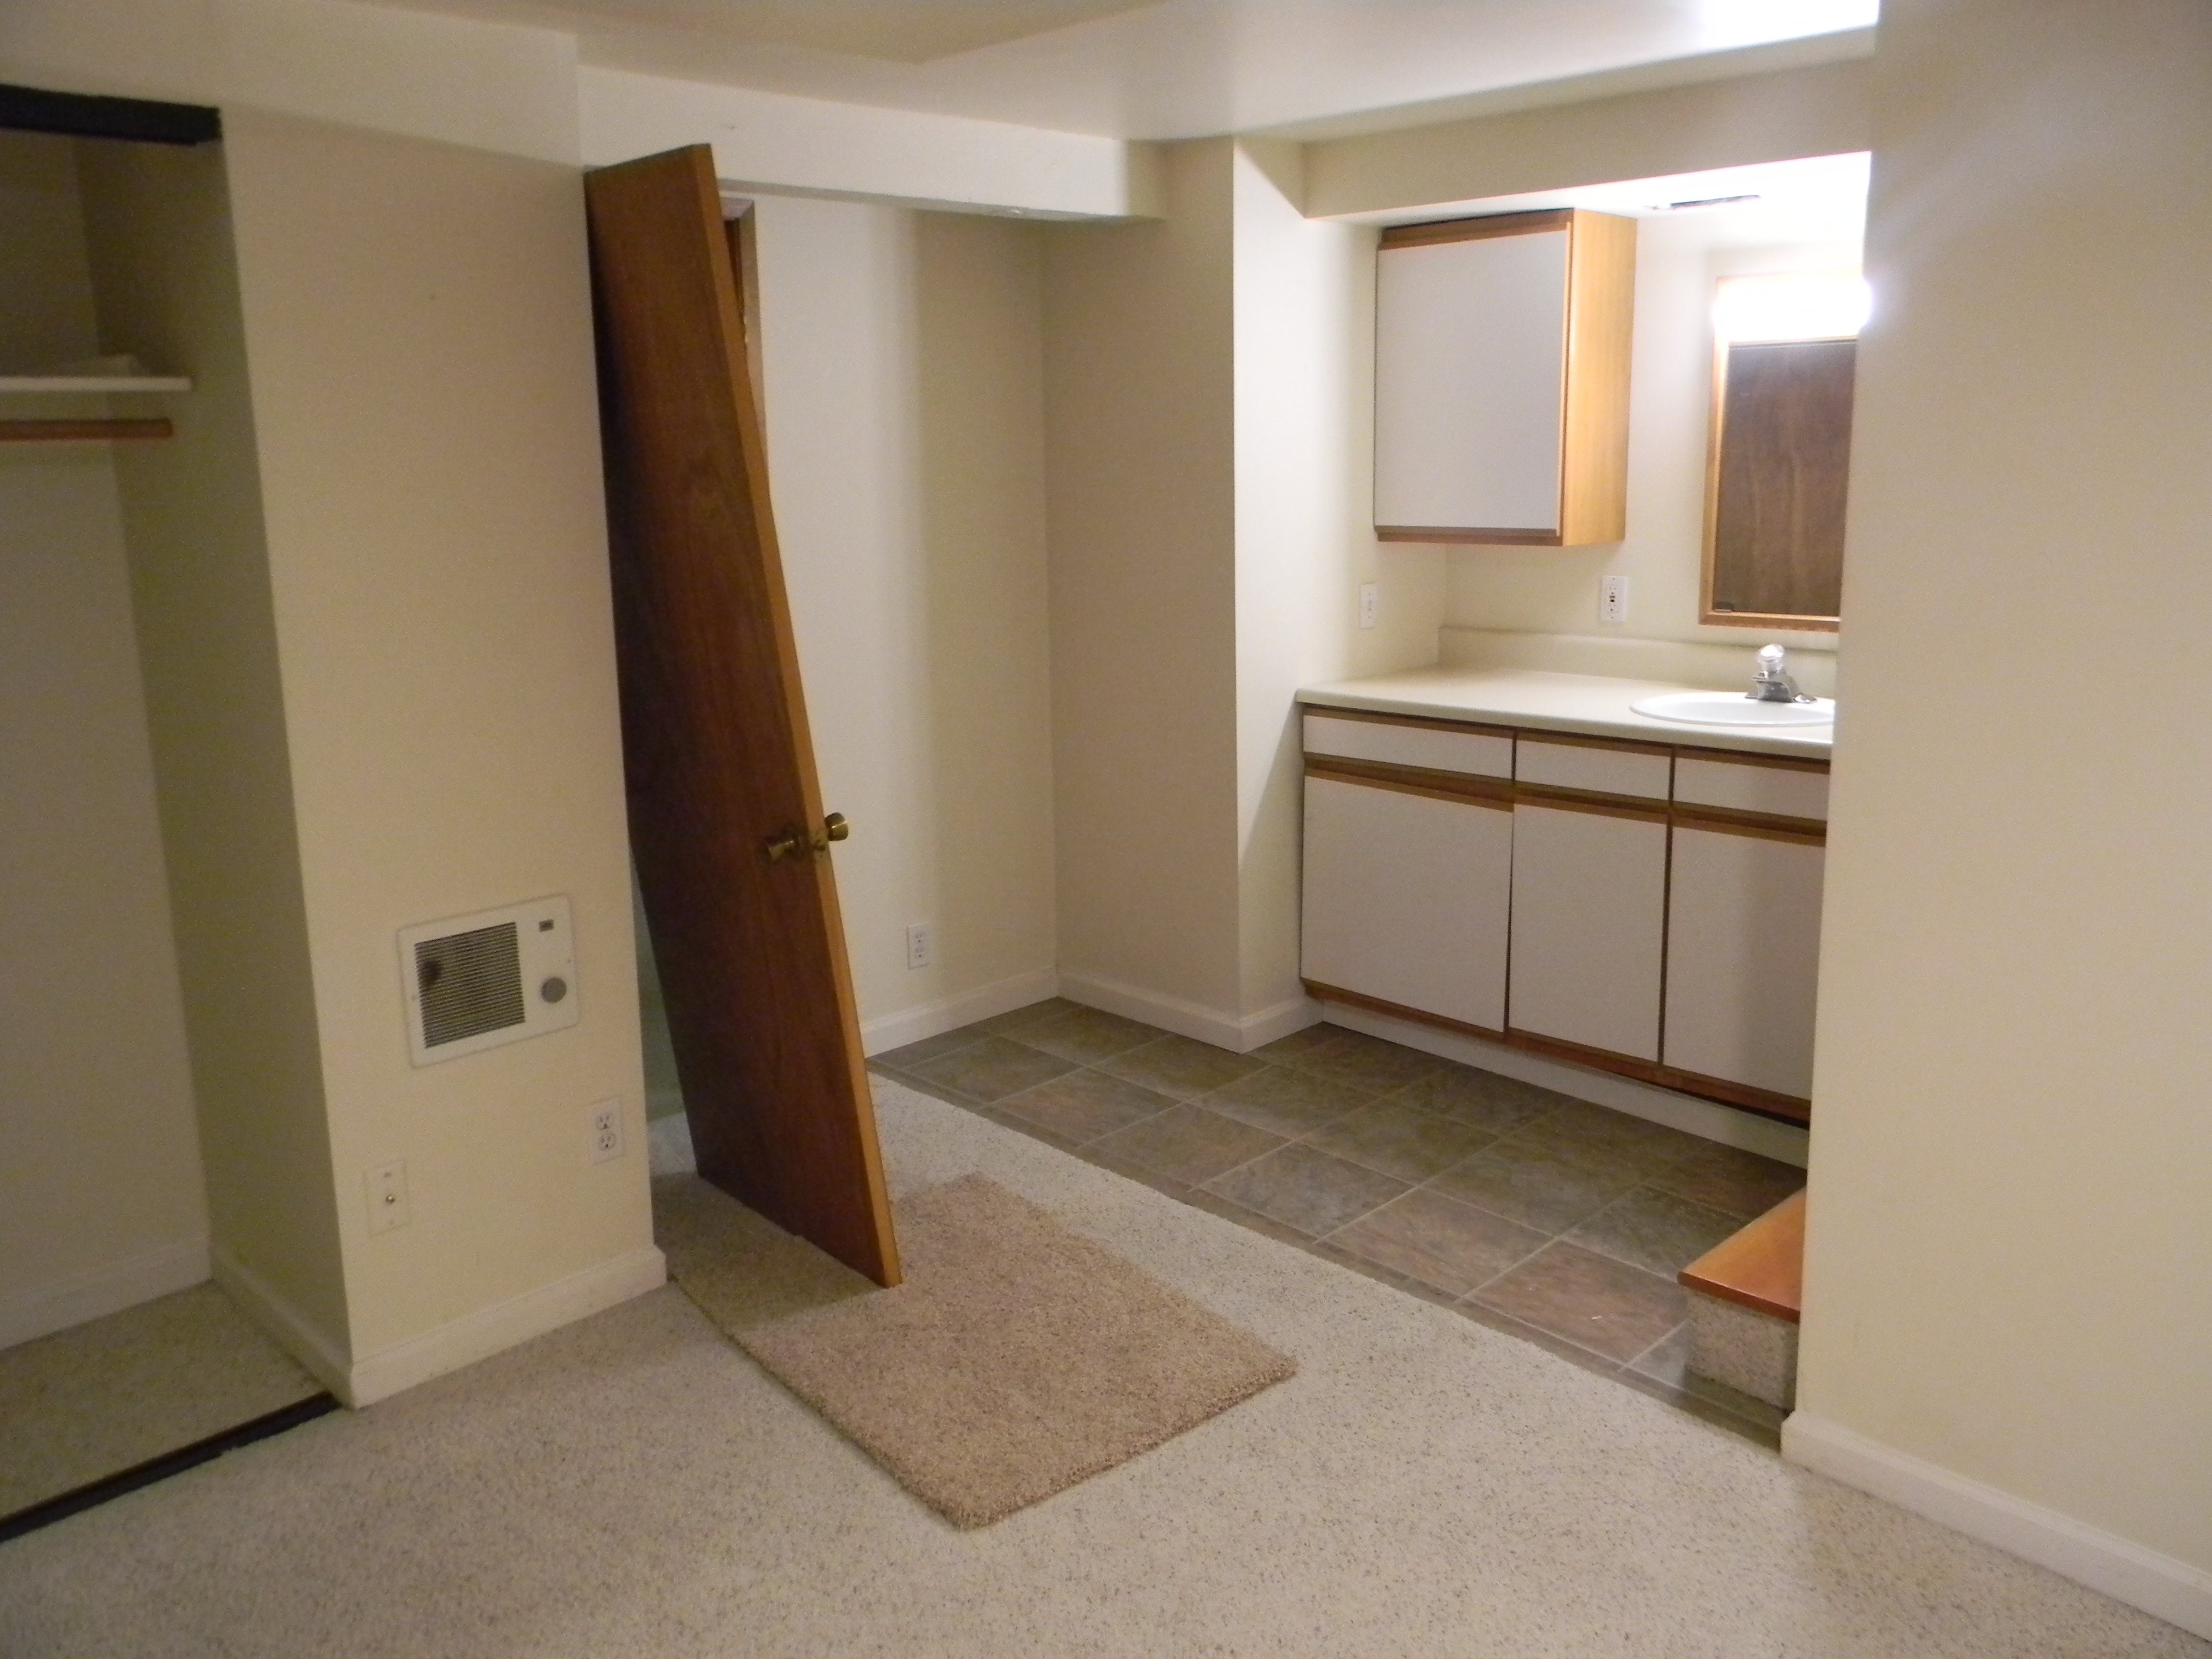 Ken Baune Homes and Remodel image 4